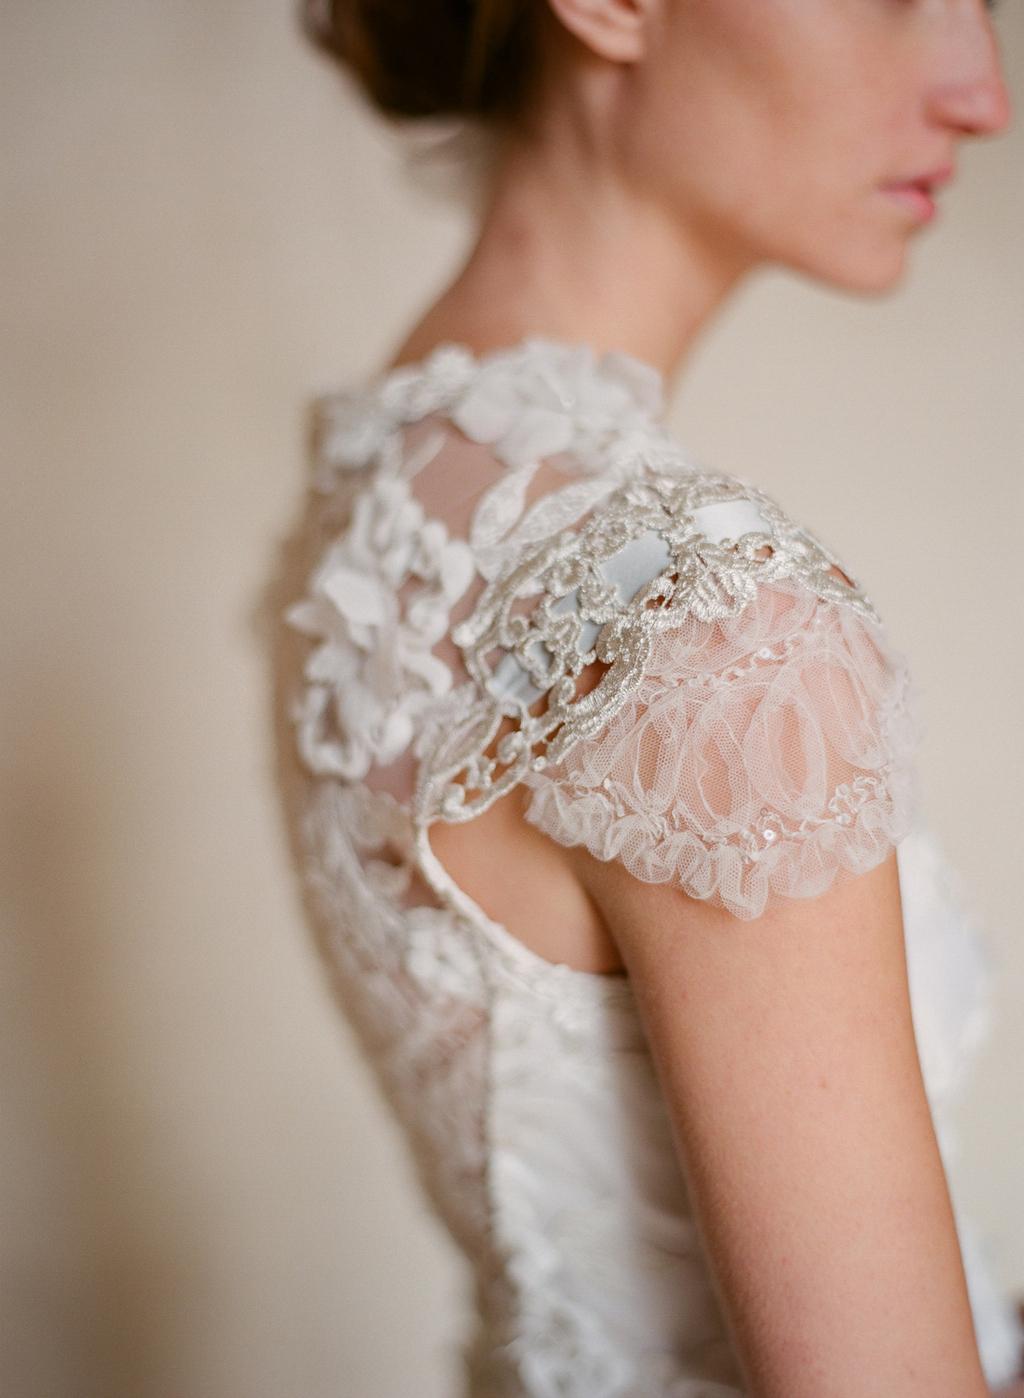 Claire-pettibone-wedding-dress-detail-shot-sheer-cap-sleeves.full